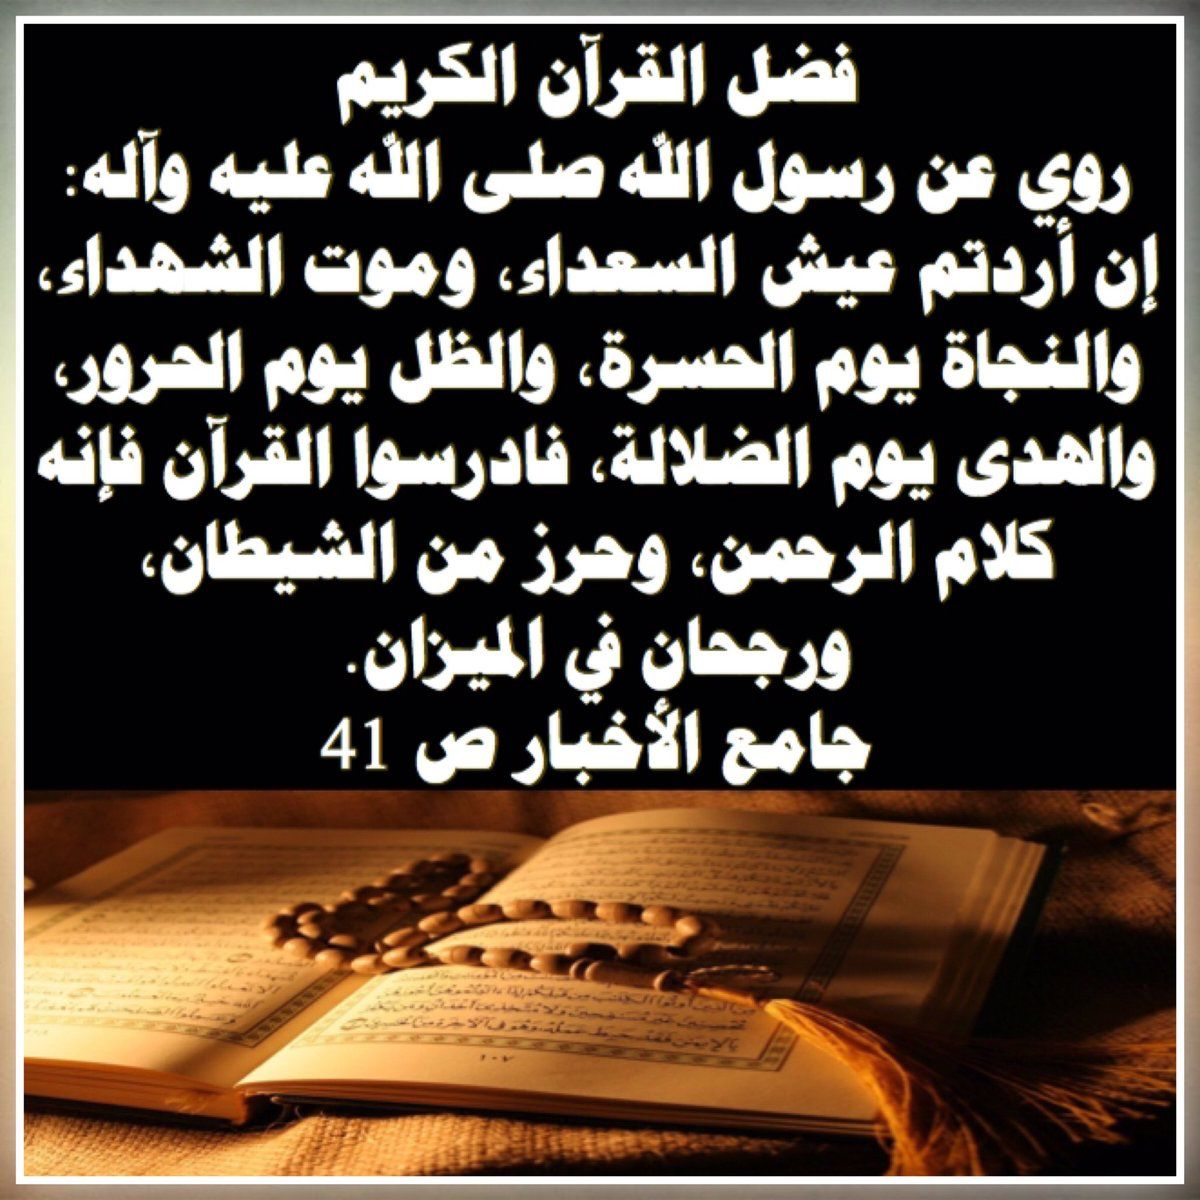 Desertrose فضل قراءة القرآن الكريم Ahadith Islam Quran Islam